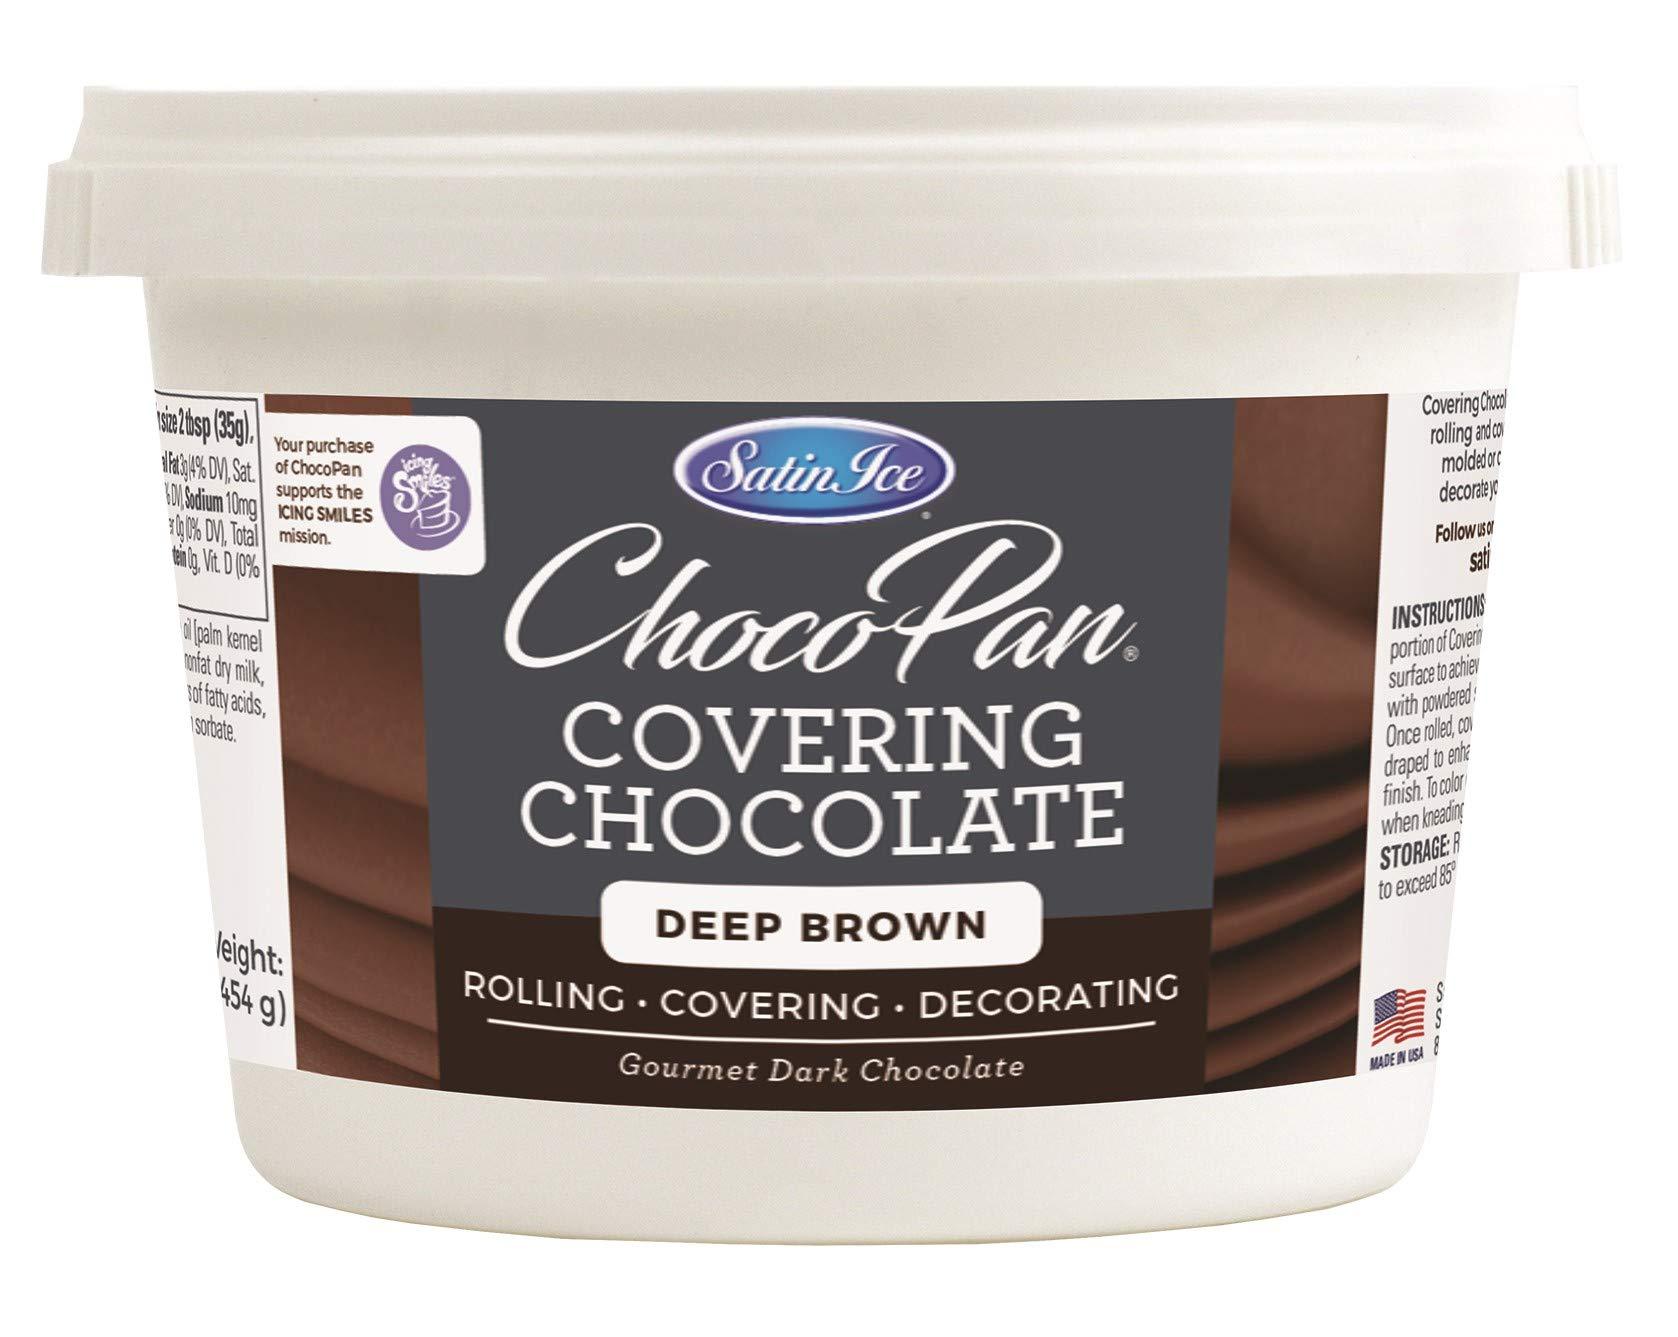 Satin Ice ChocoPan Deep Brown Covering Chocolate, 1 Pound